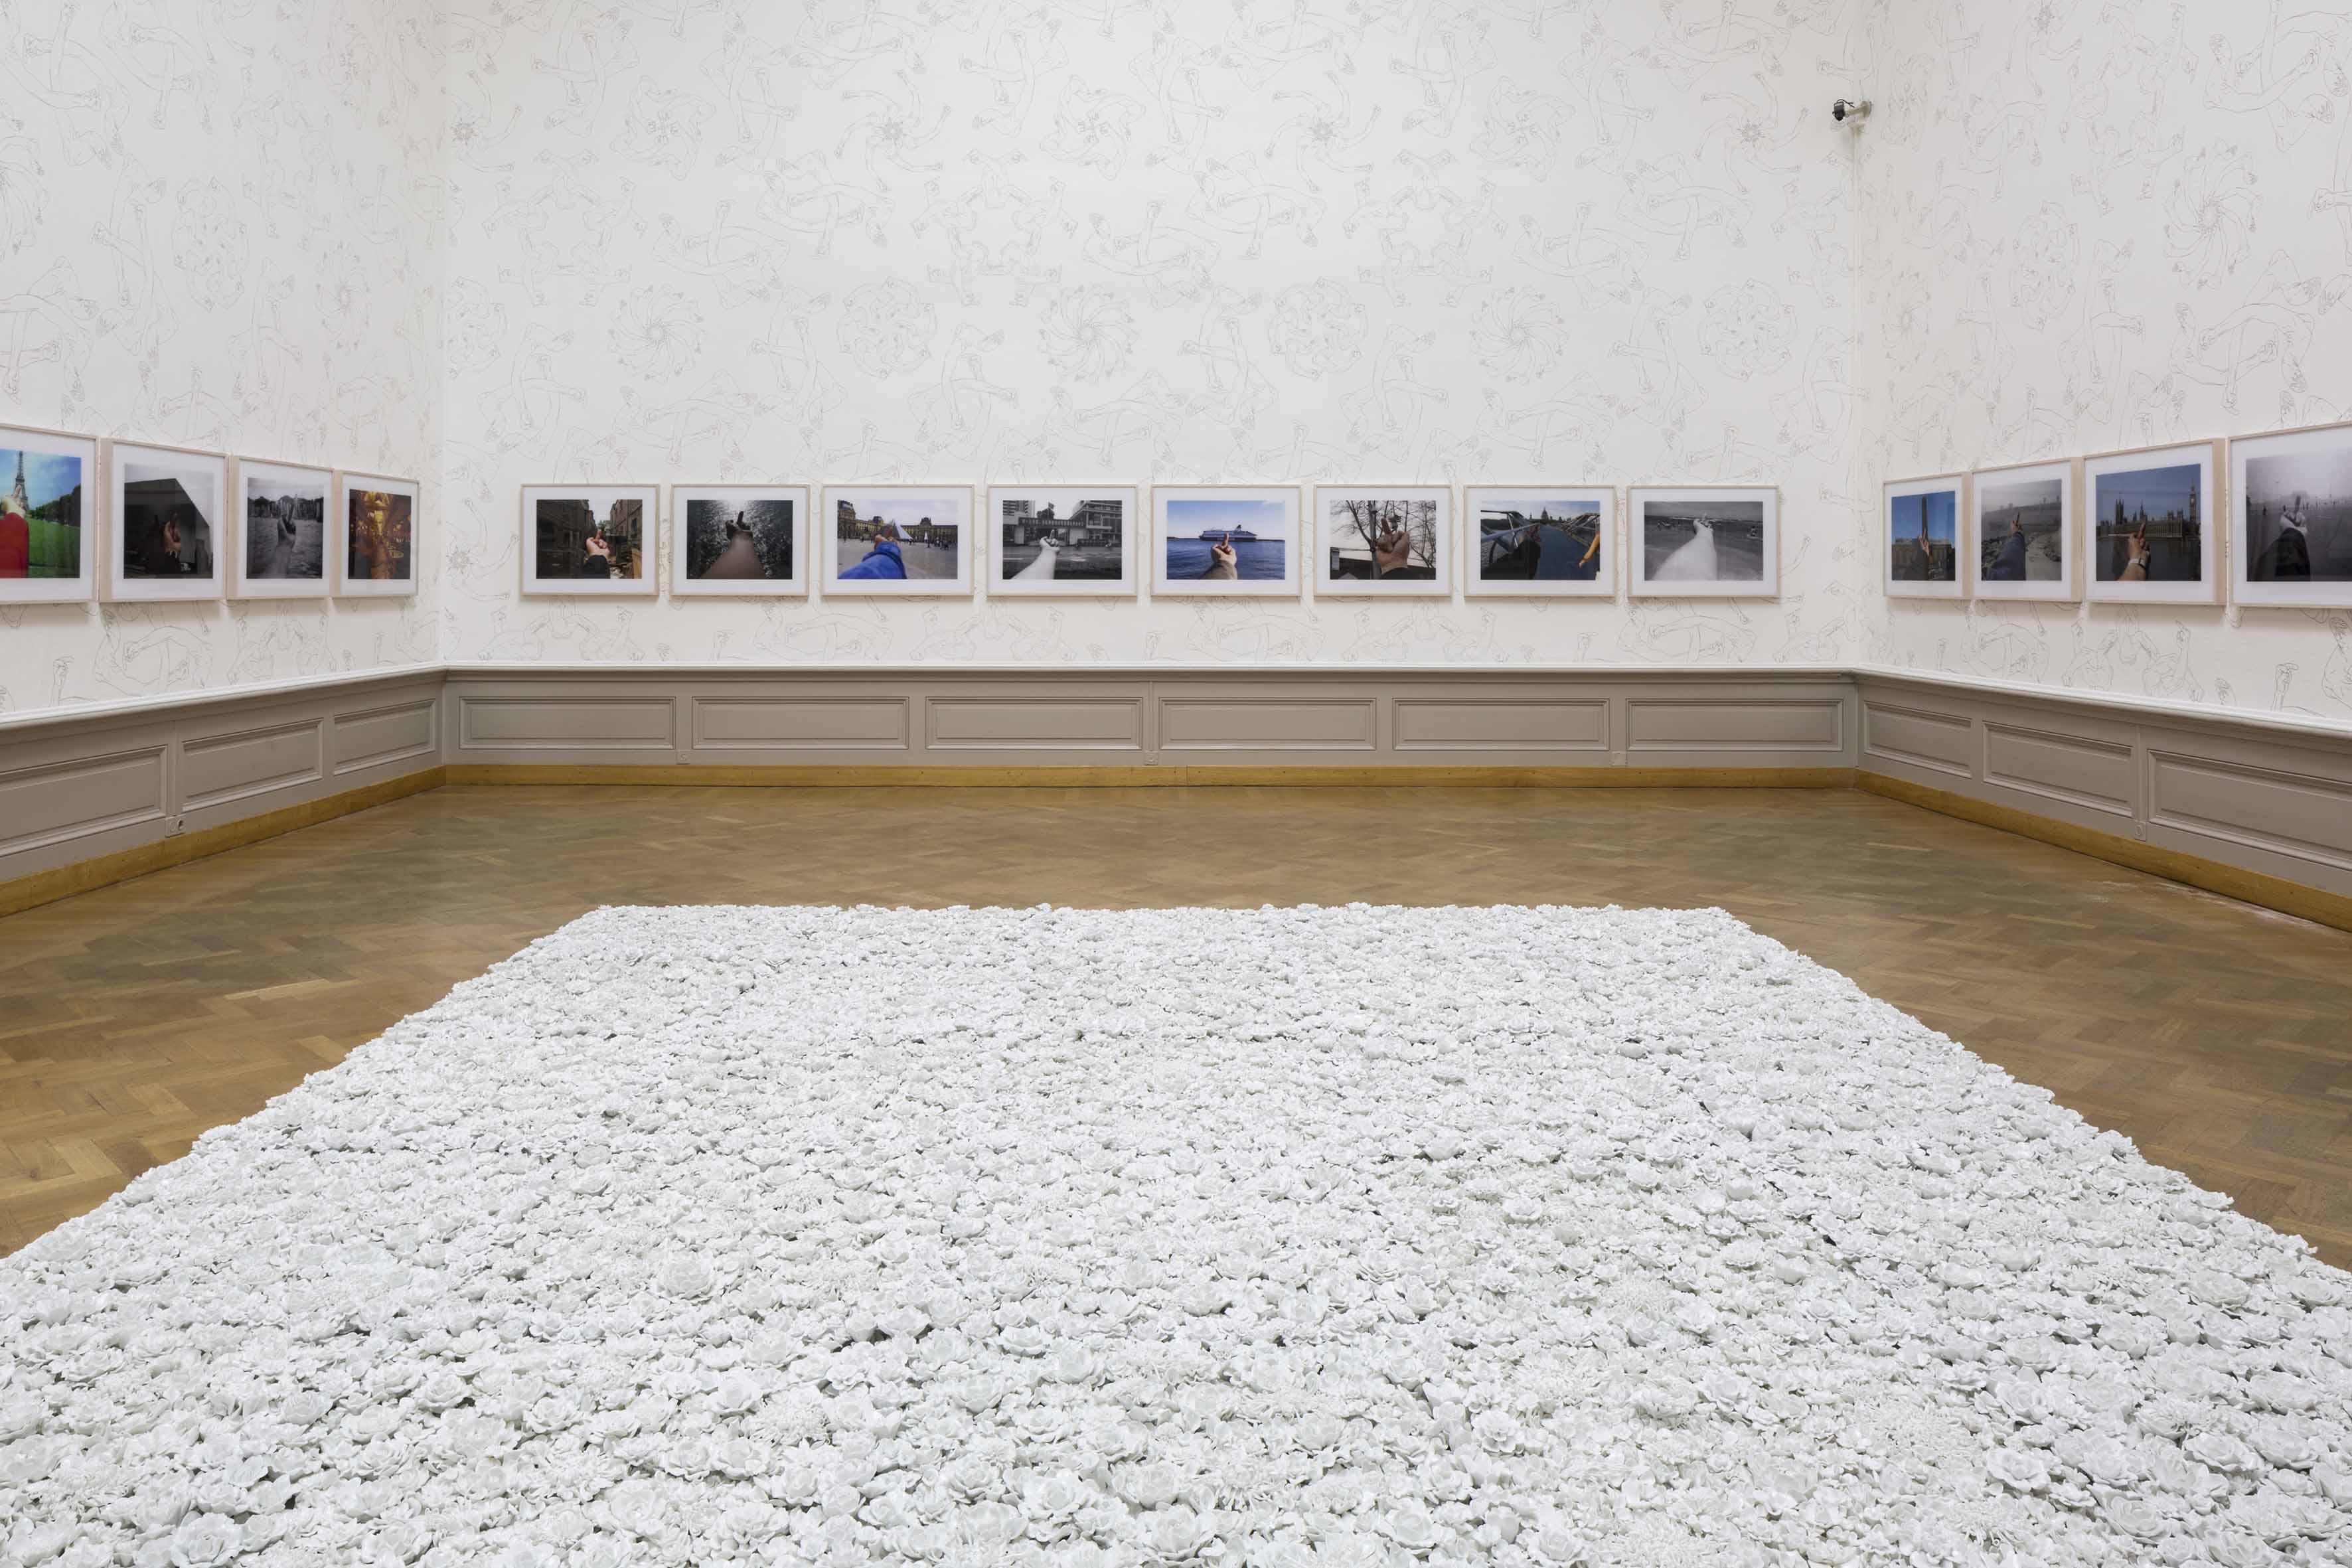 mcb-a_Ai Weiwei_Vue des salles_presse_MCBA_4